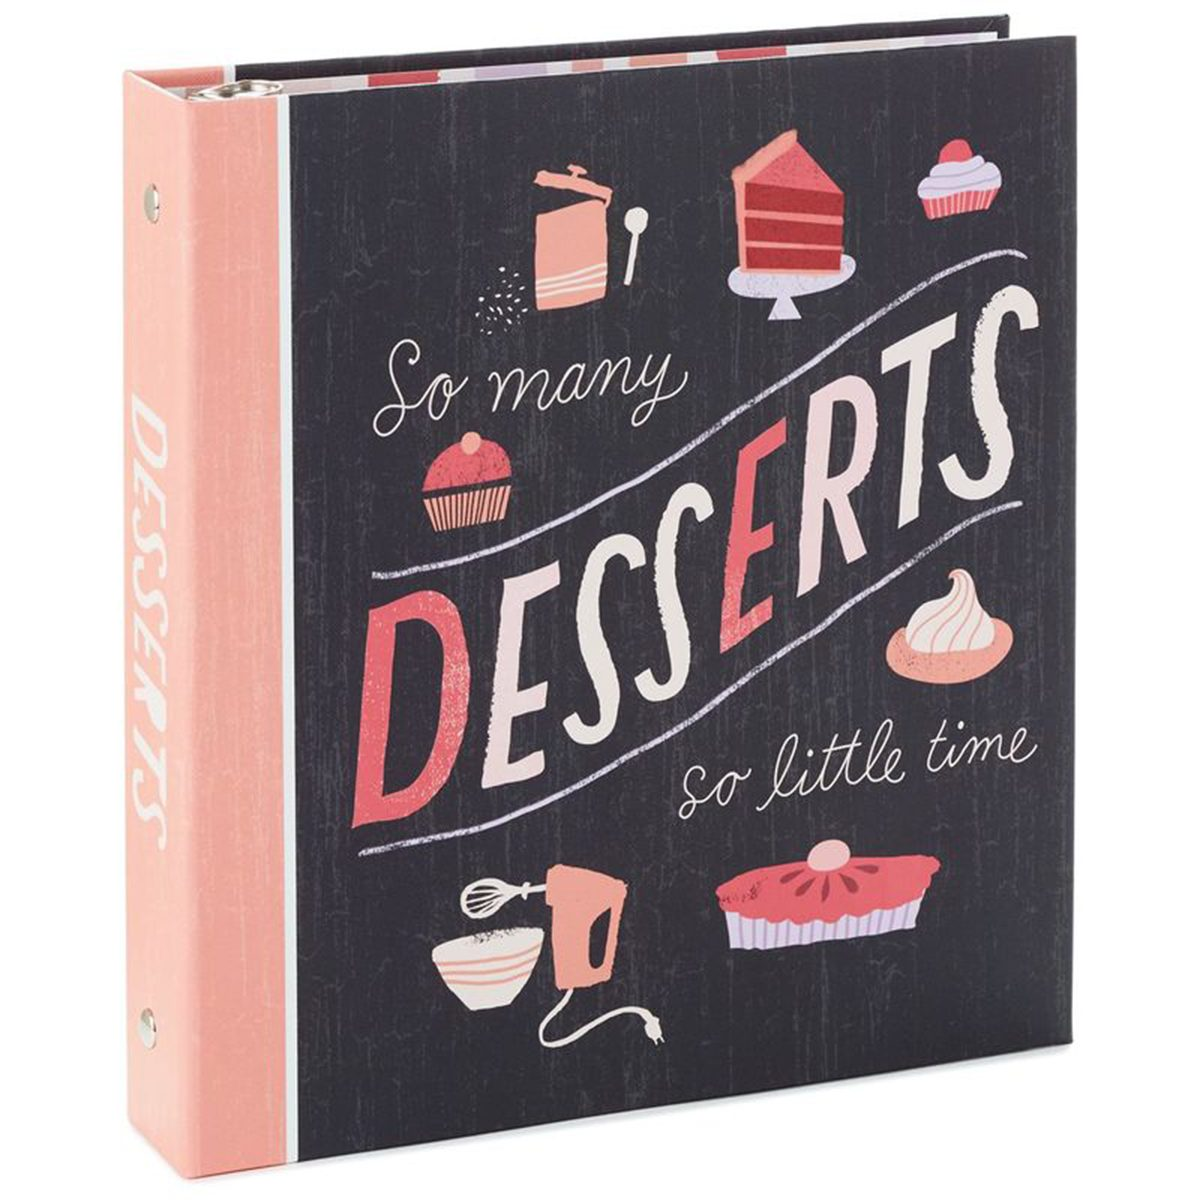 Dessert-themed recipe book